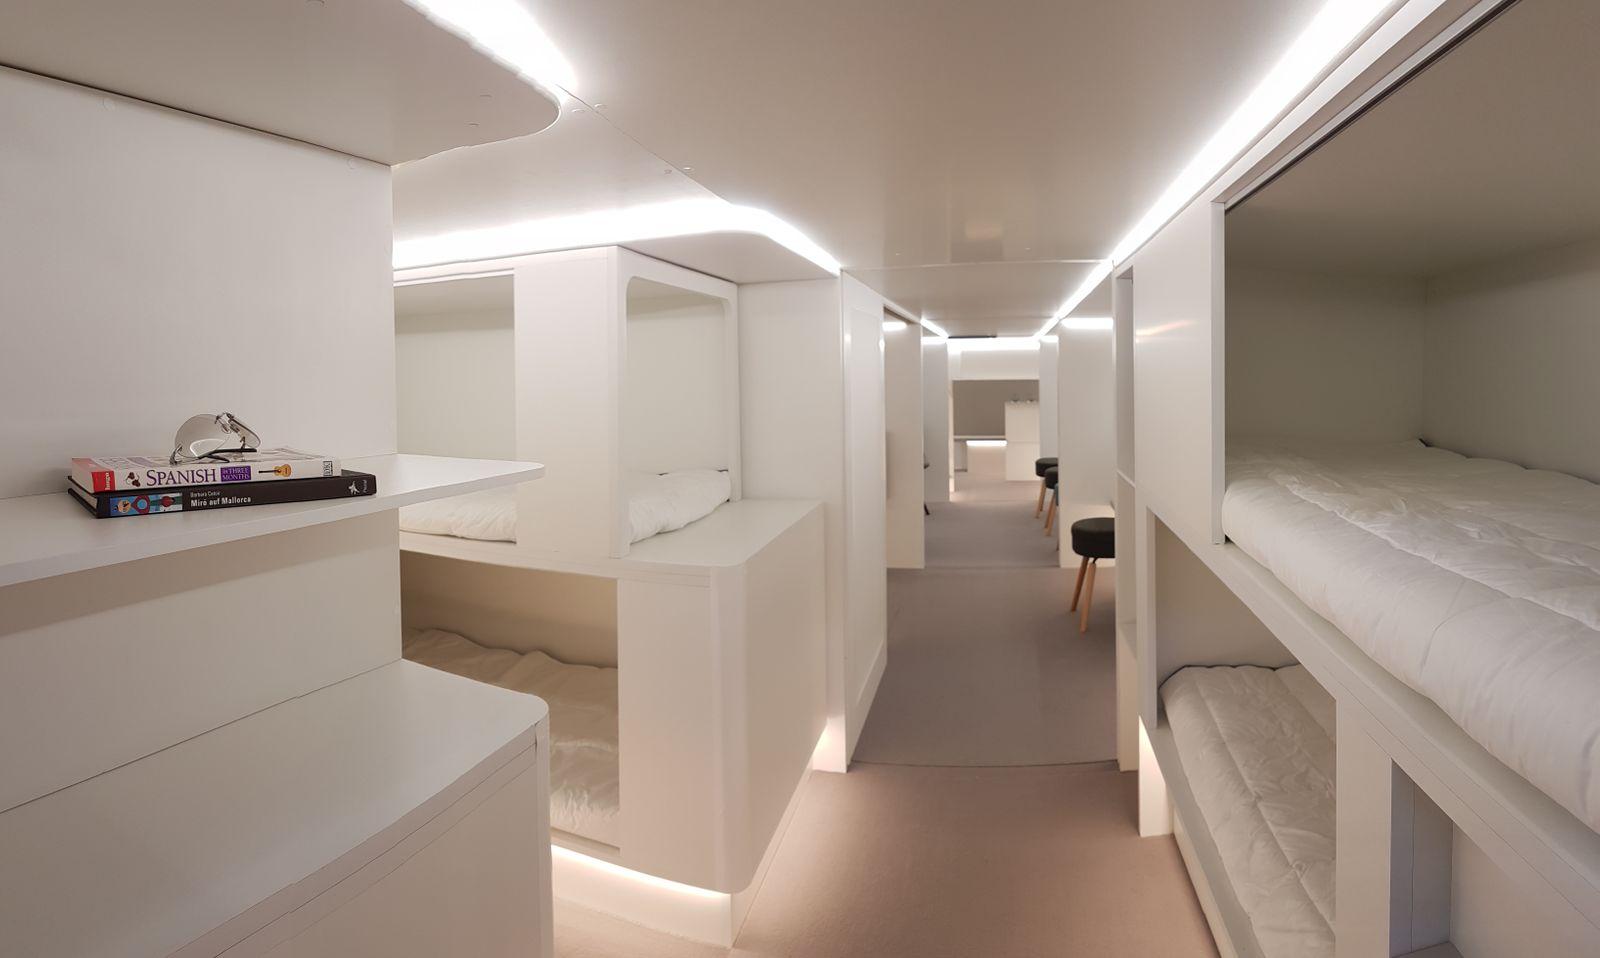 Airbus / Betten